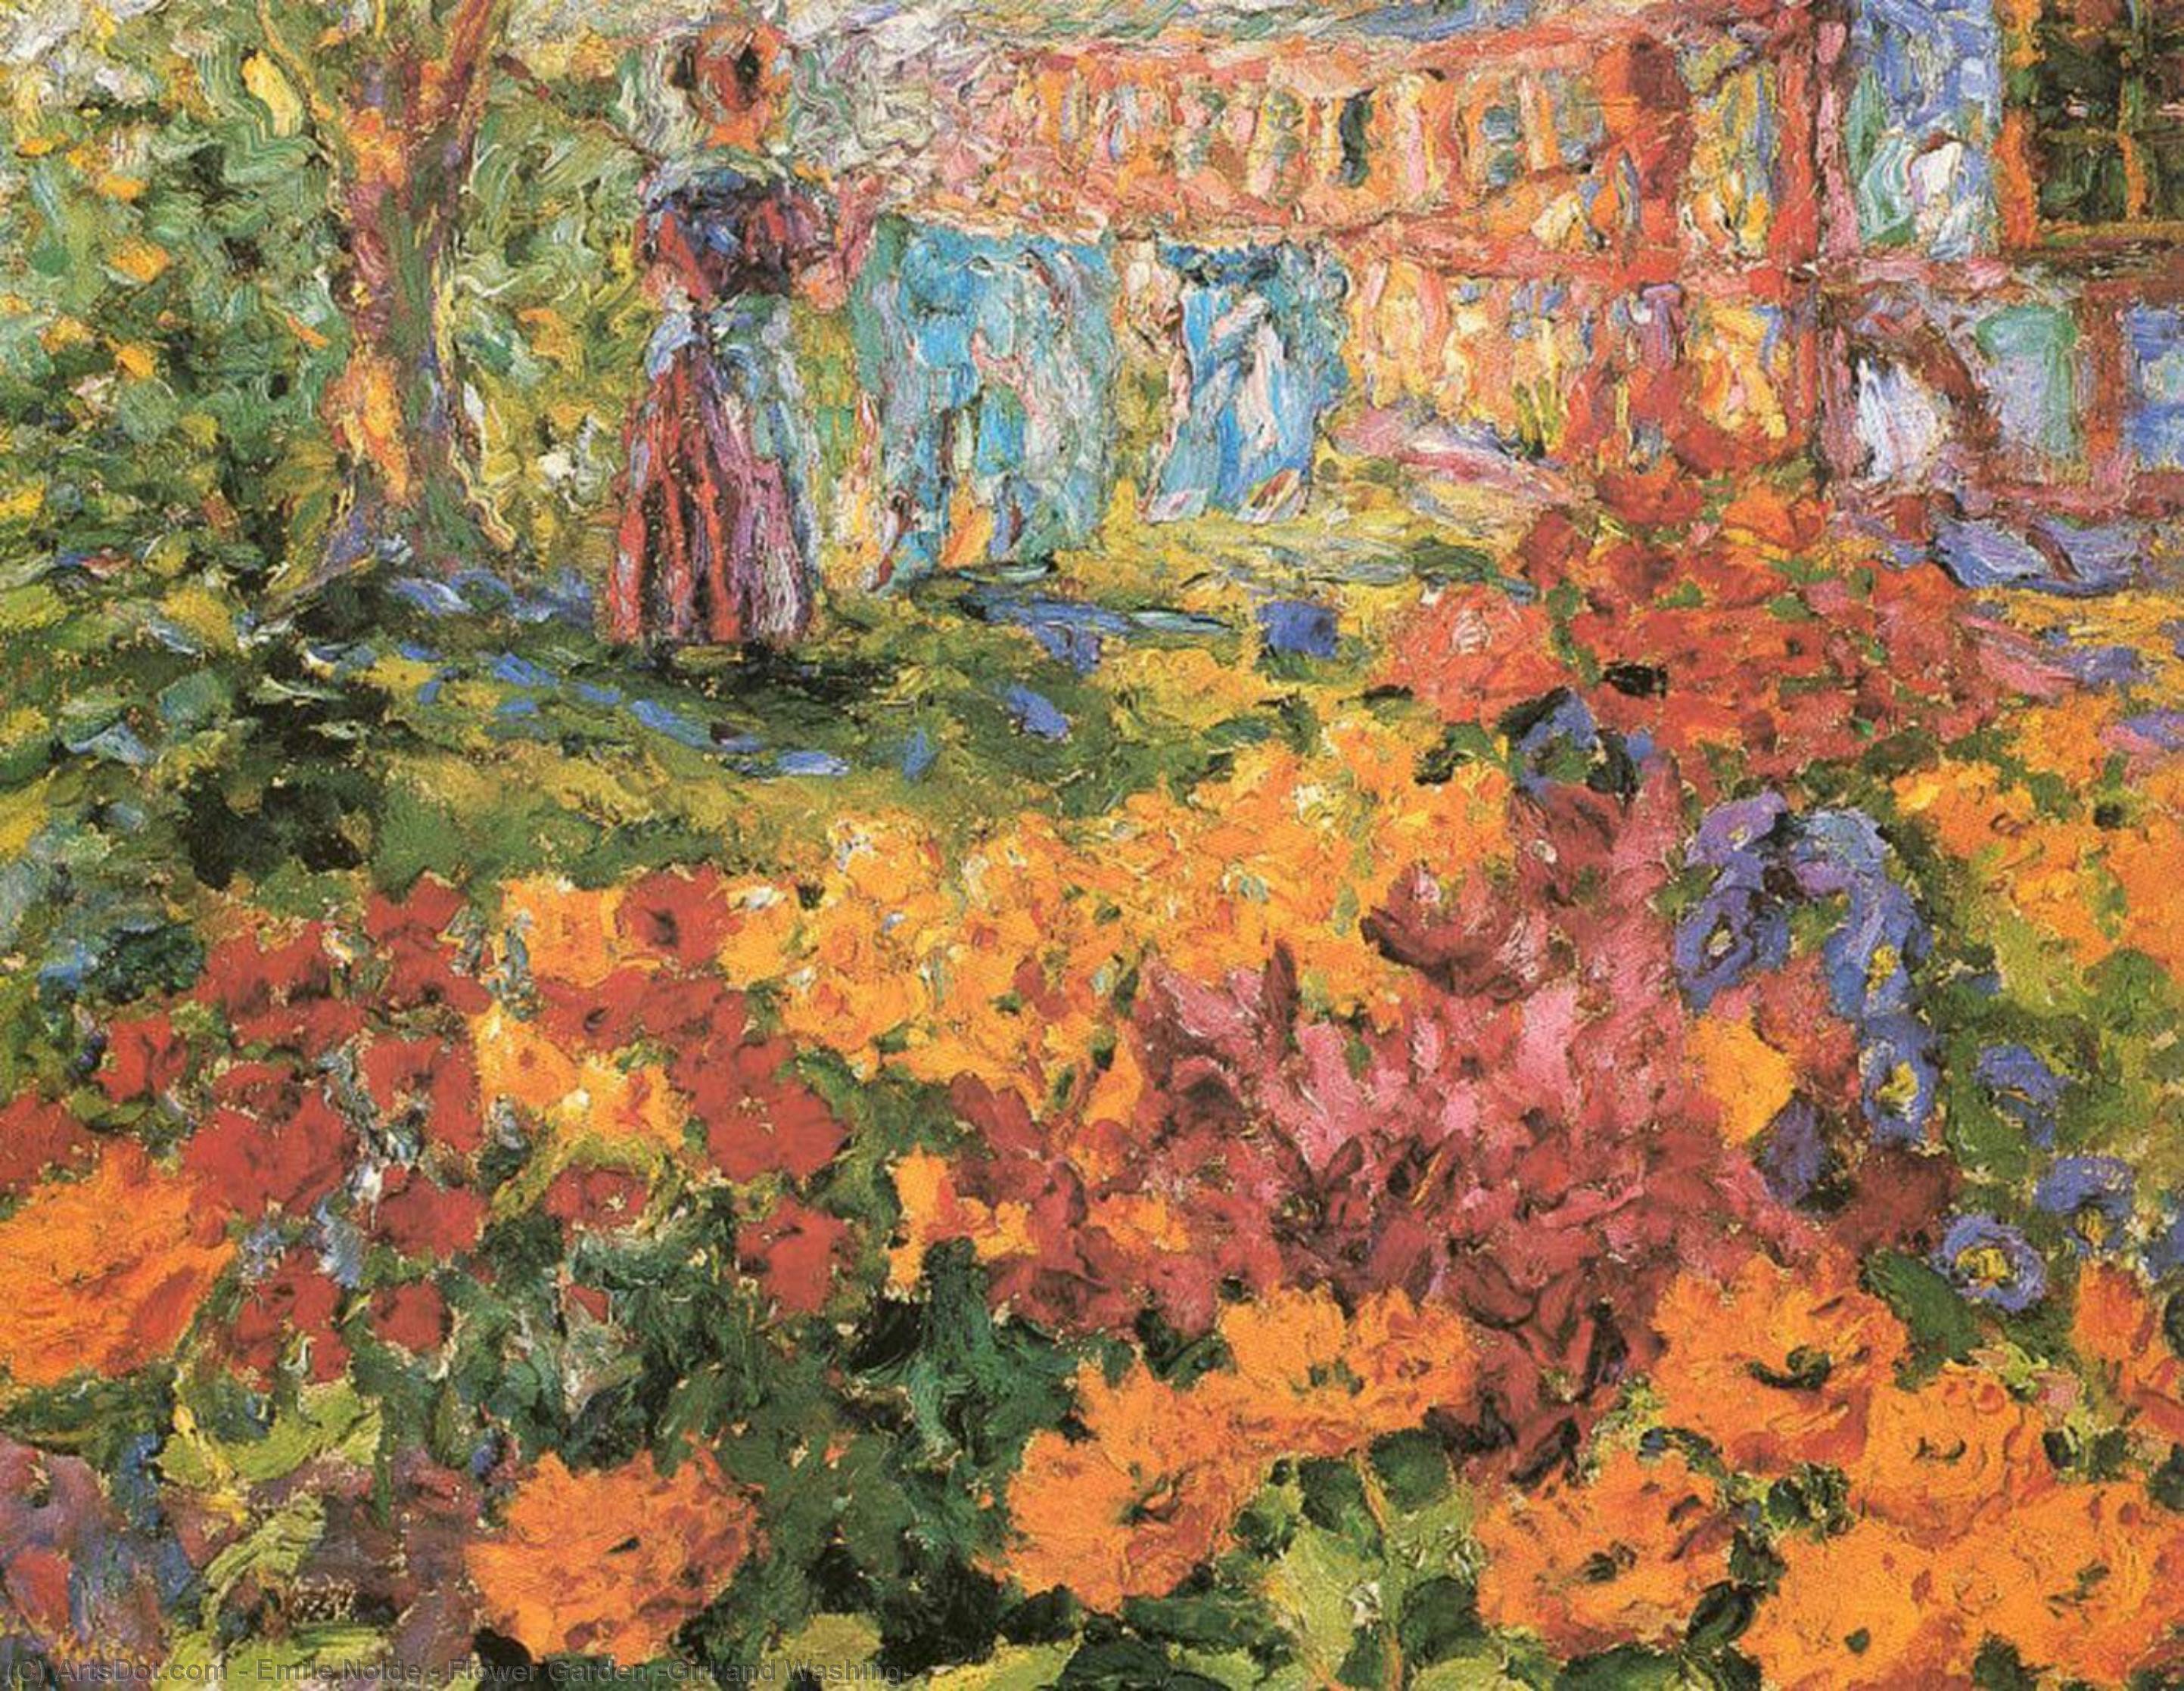 Wikoo.org - موسوعة الفنون الجميلة - اللوحة، العمل الفني Emile Nolde - Flower Garden (Girl and Washing)